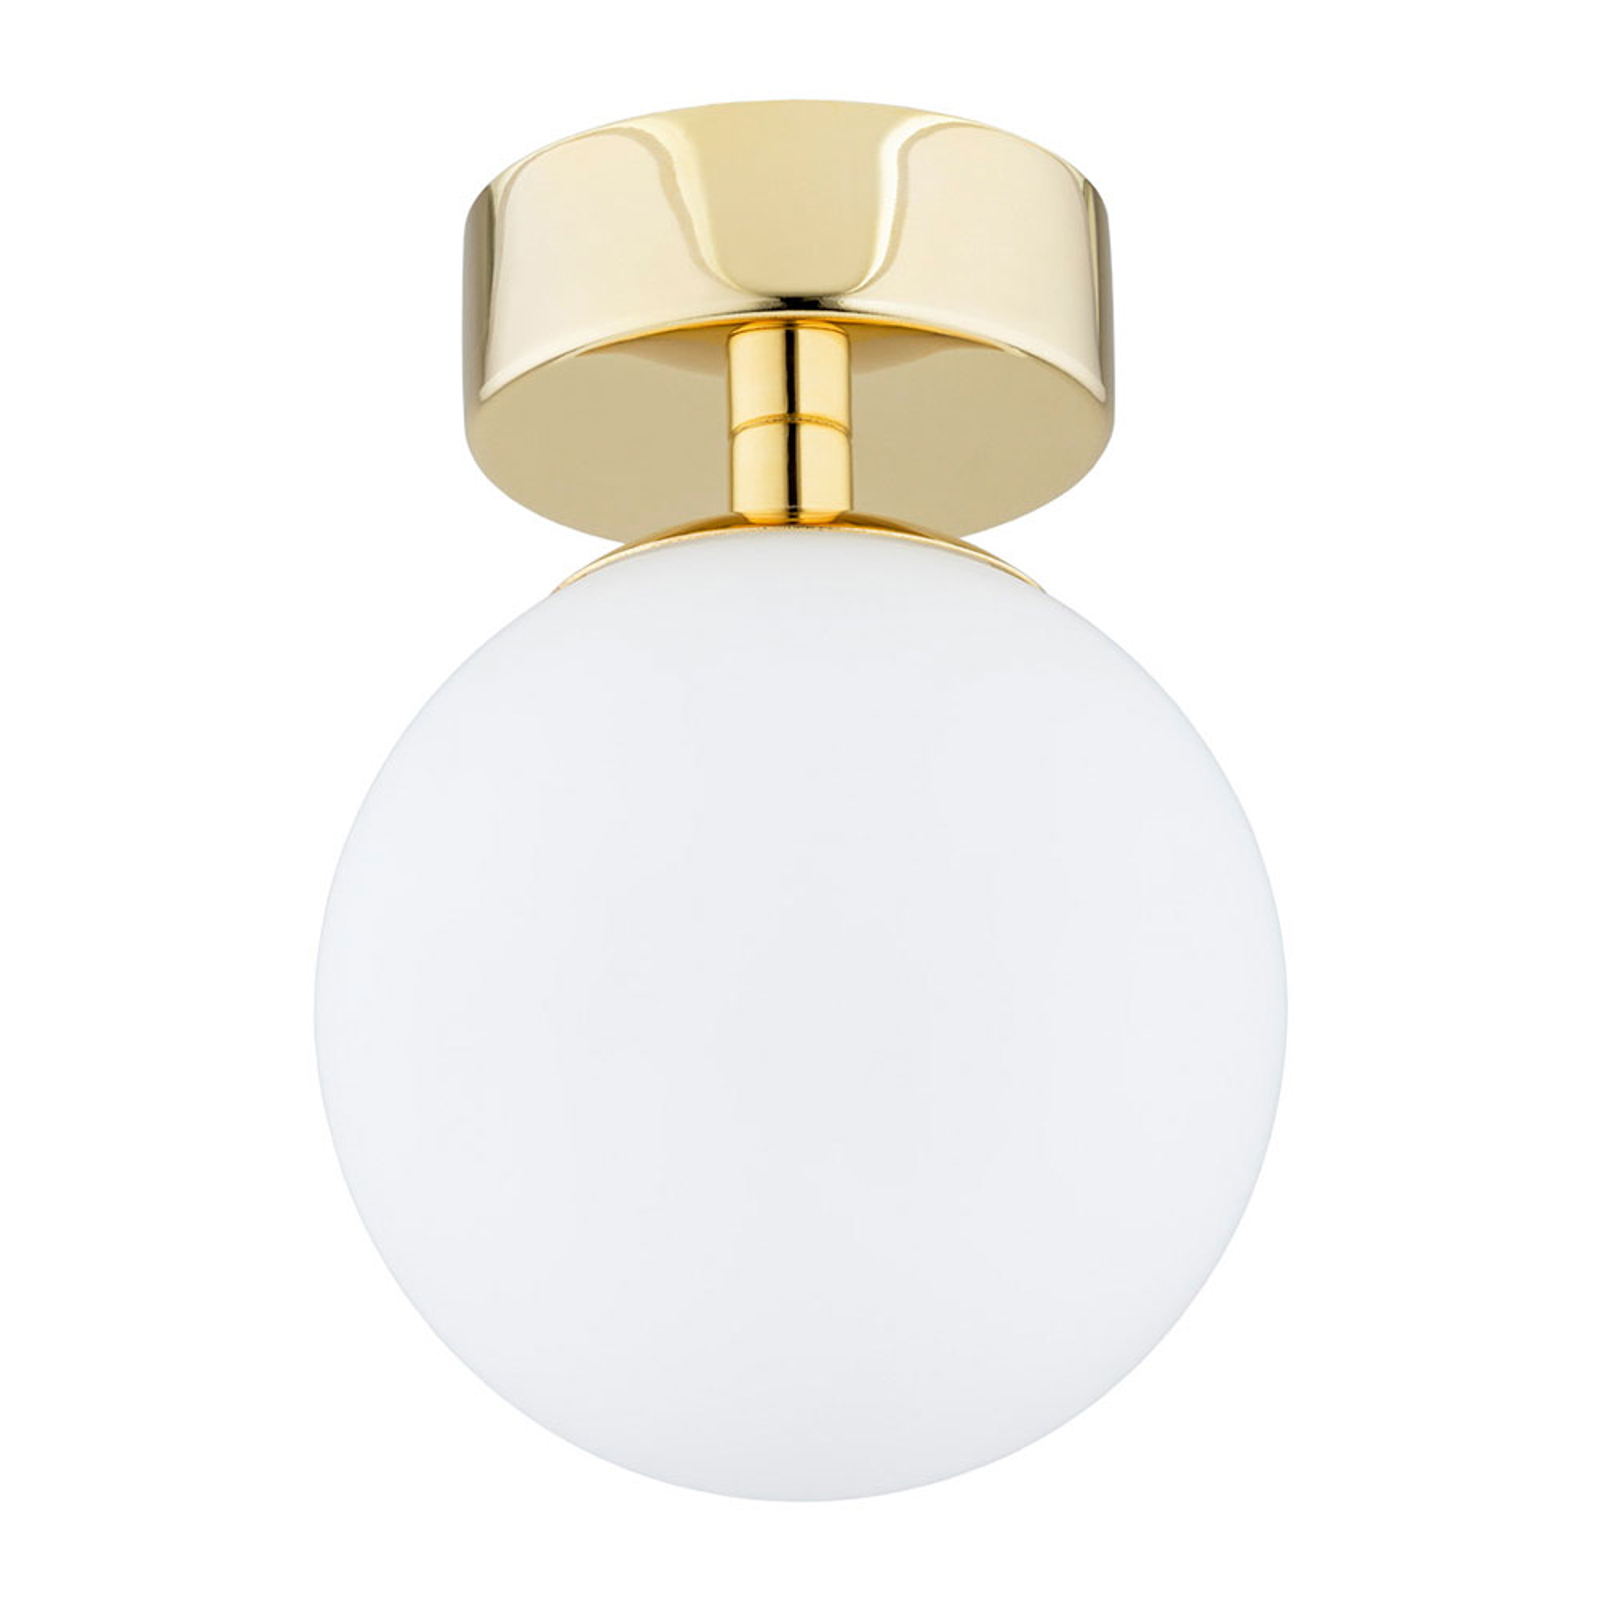 Fatis loftlampe, 1 lyskilde